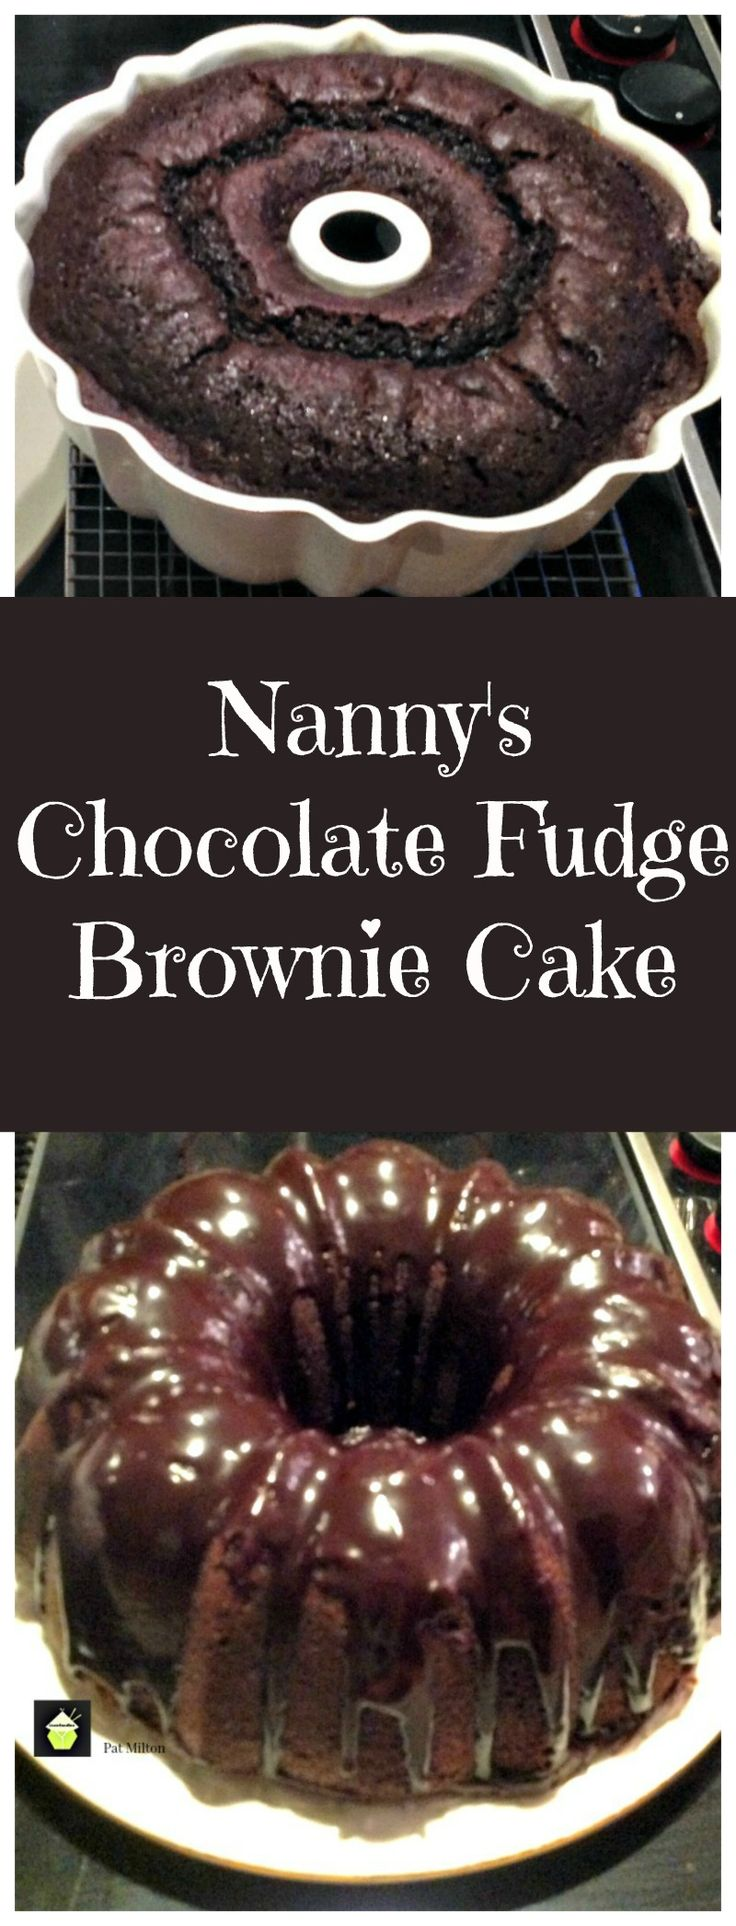 Best 20+ Chocolate fudge brownies ideas on Pinterest | Fudge ...